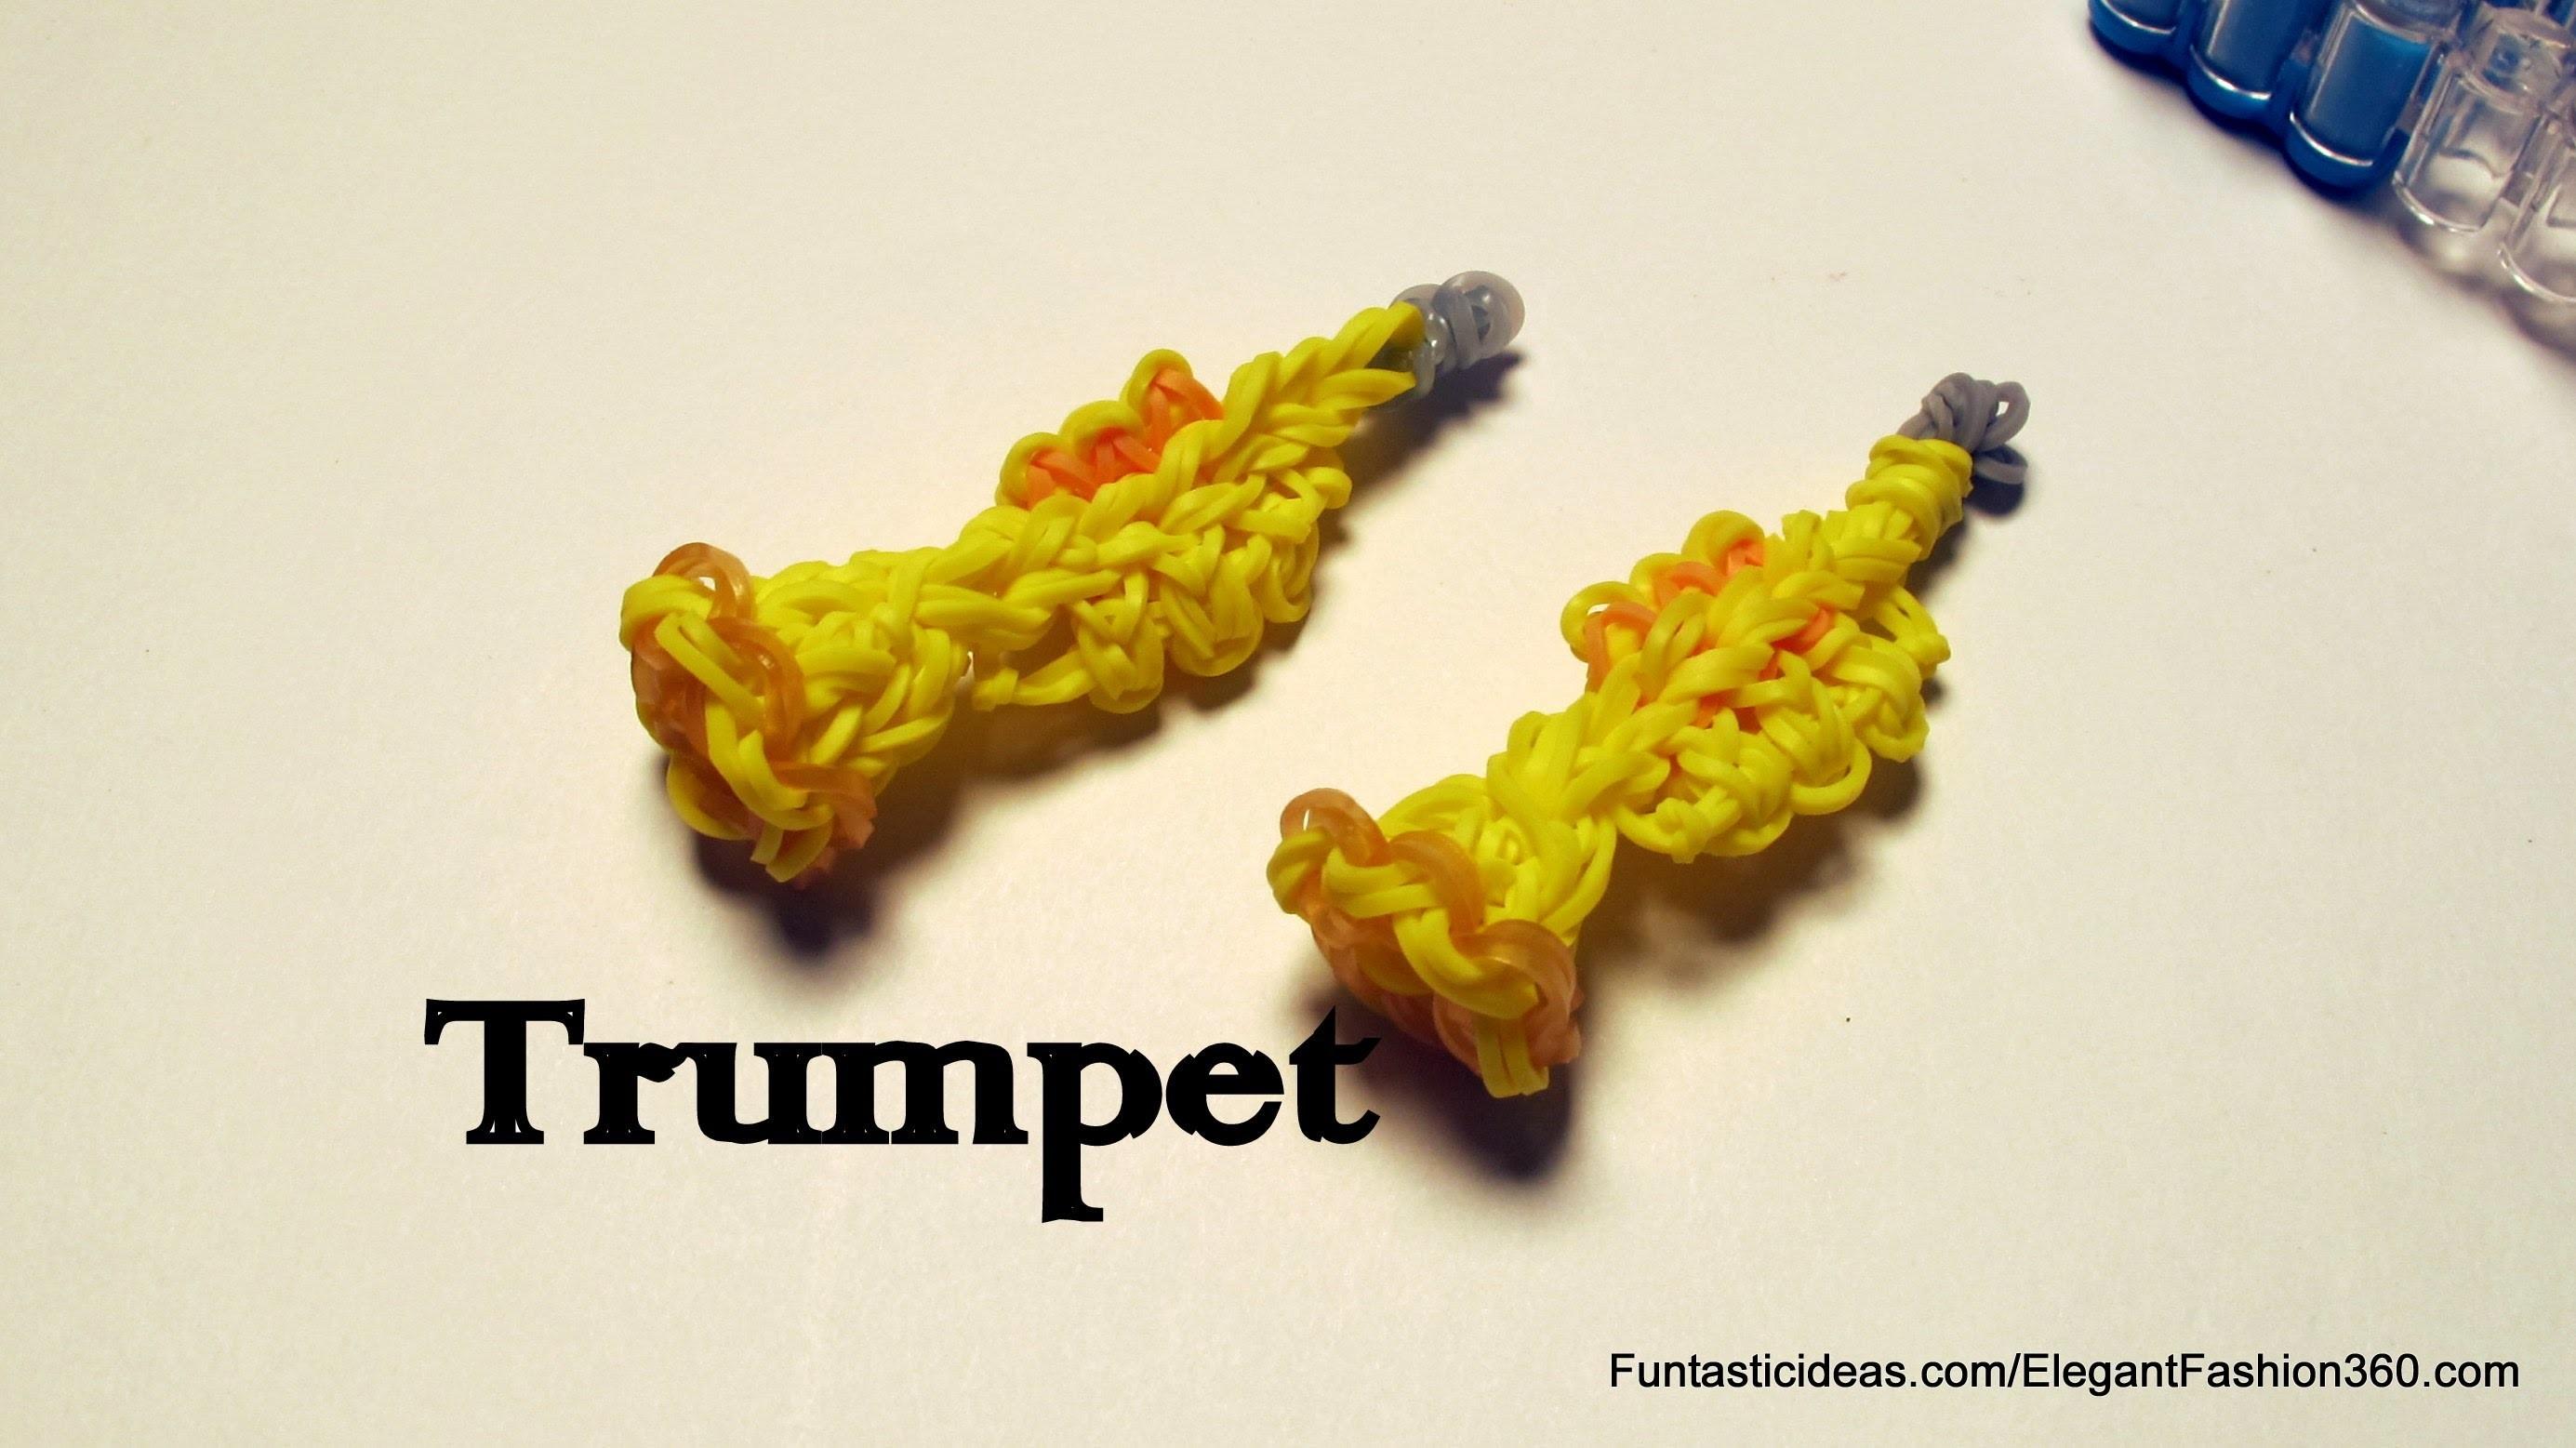 Rainbow Loom Trumpet Charm - How to - Emoji.Emoticon